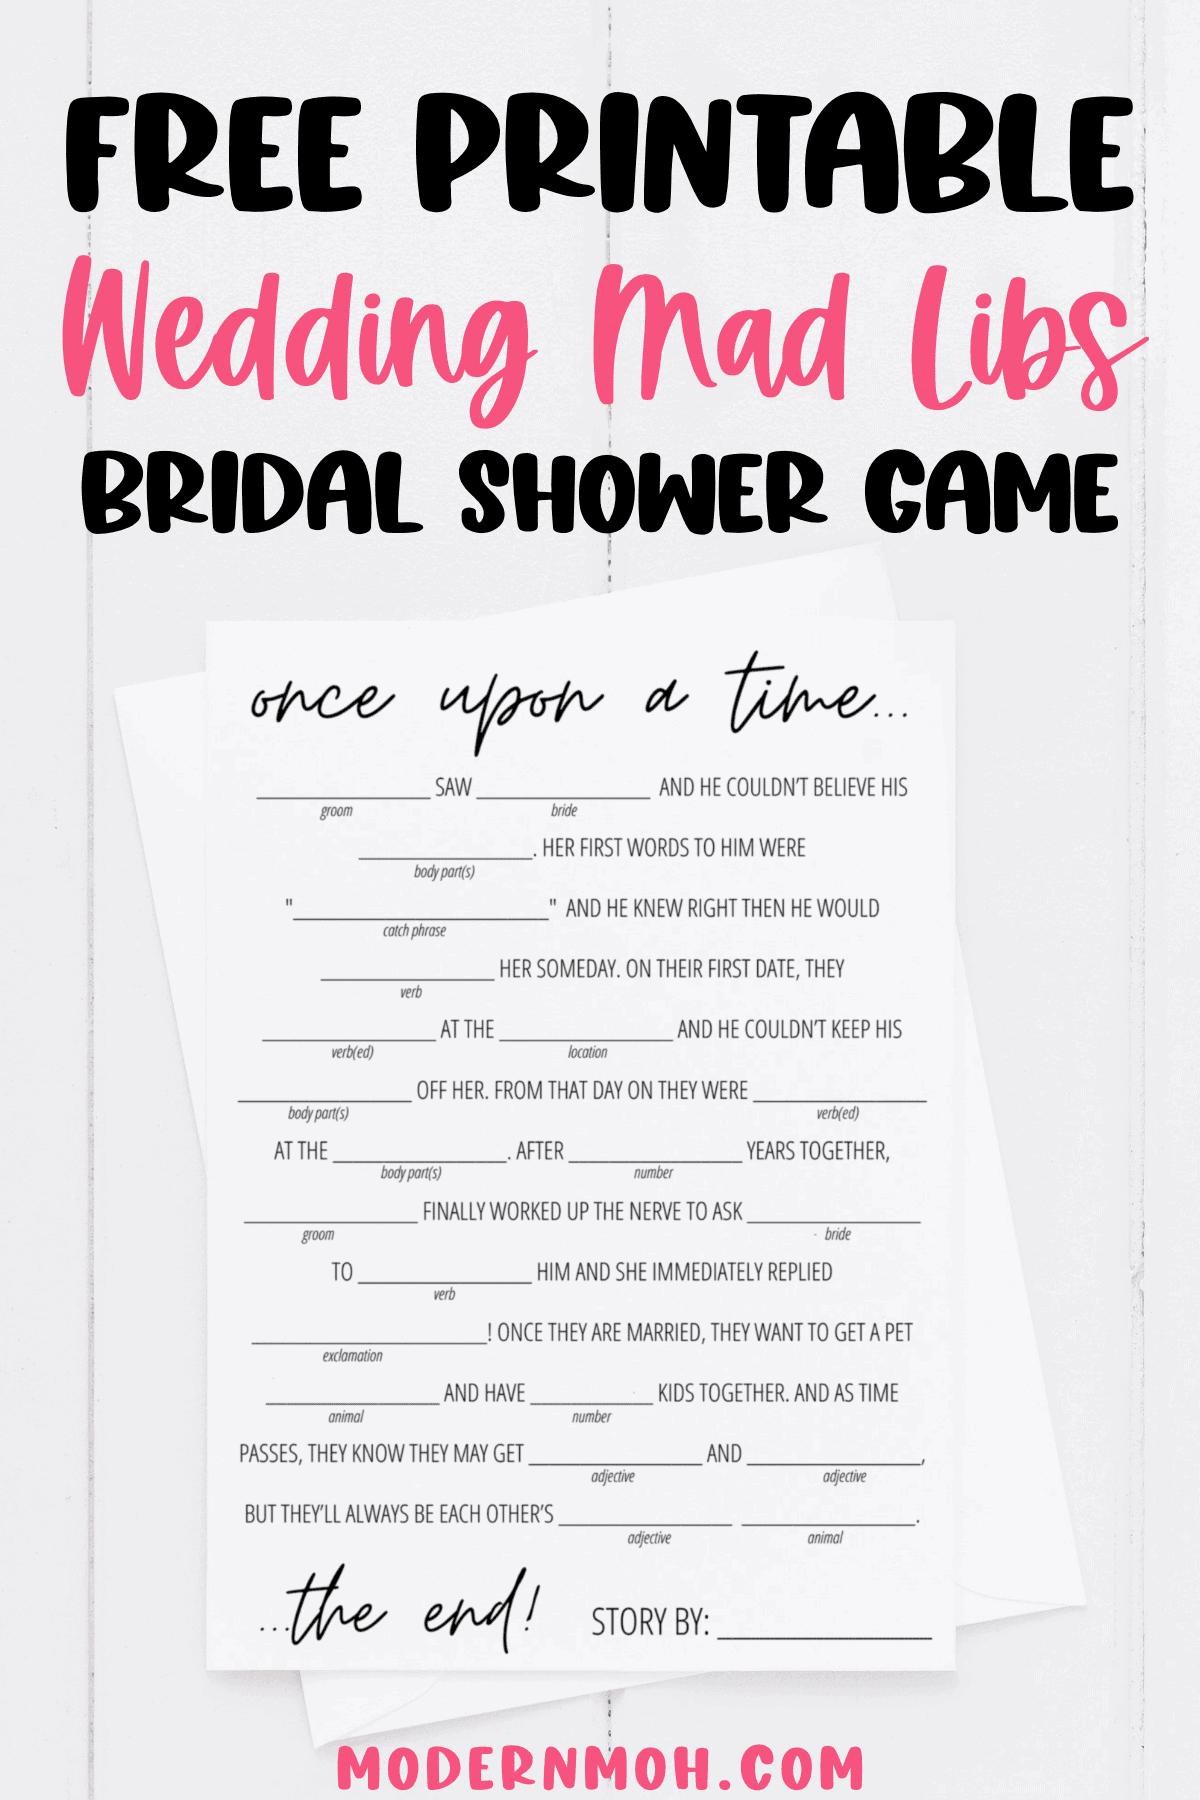 Bridal Shower Mad Libs Free Printable